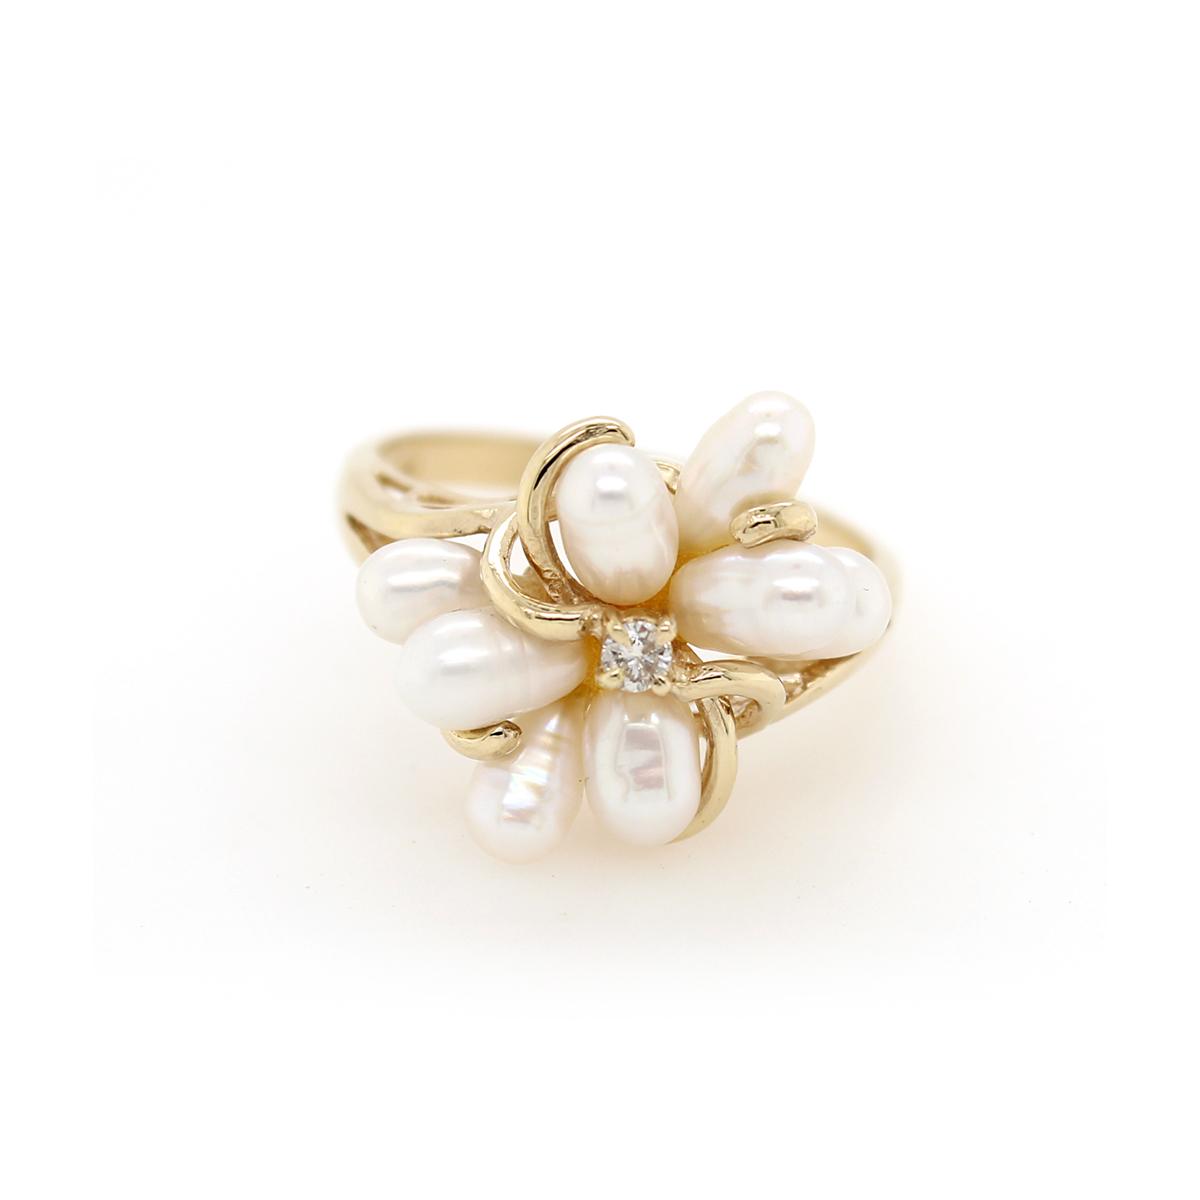 Vintage 14 Karat Yellow Gold Diamond and Pearl Ring